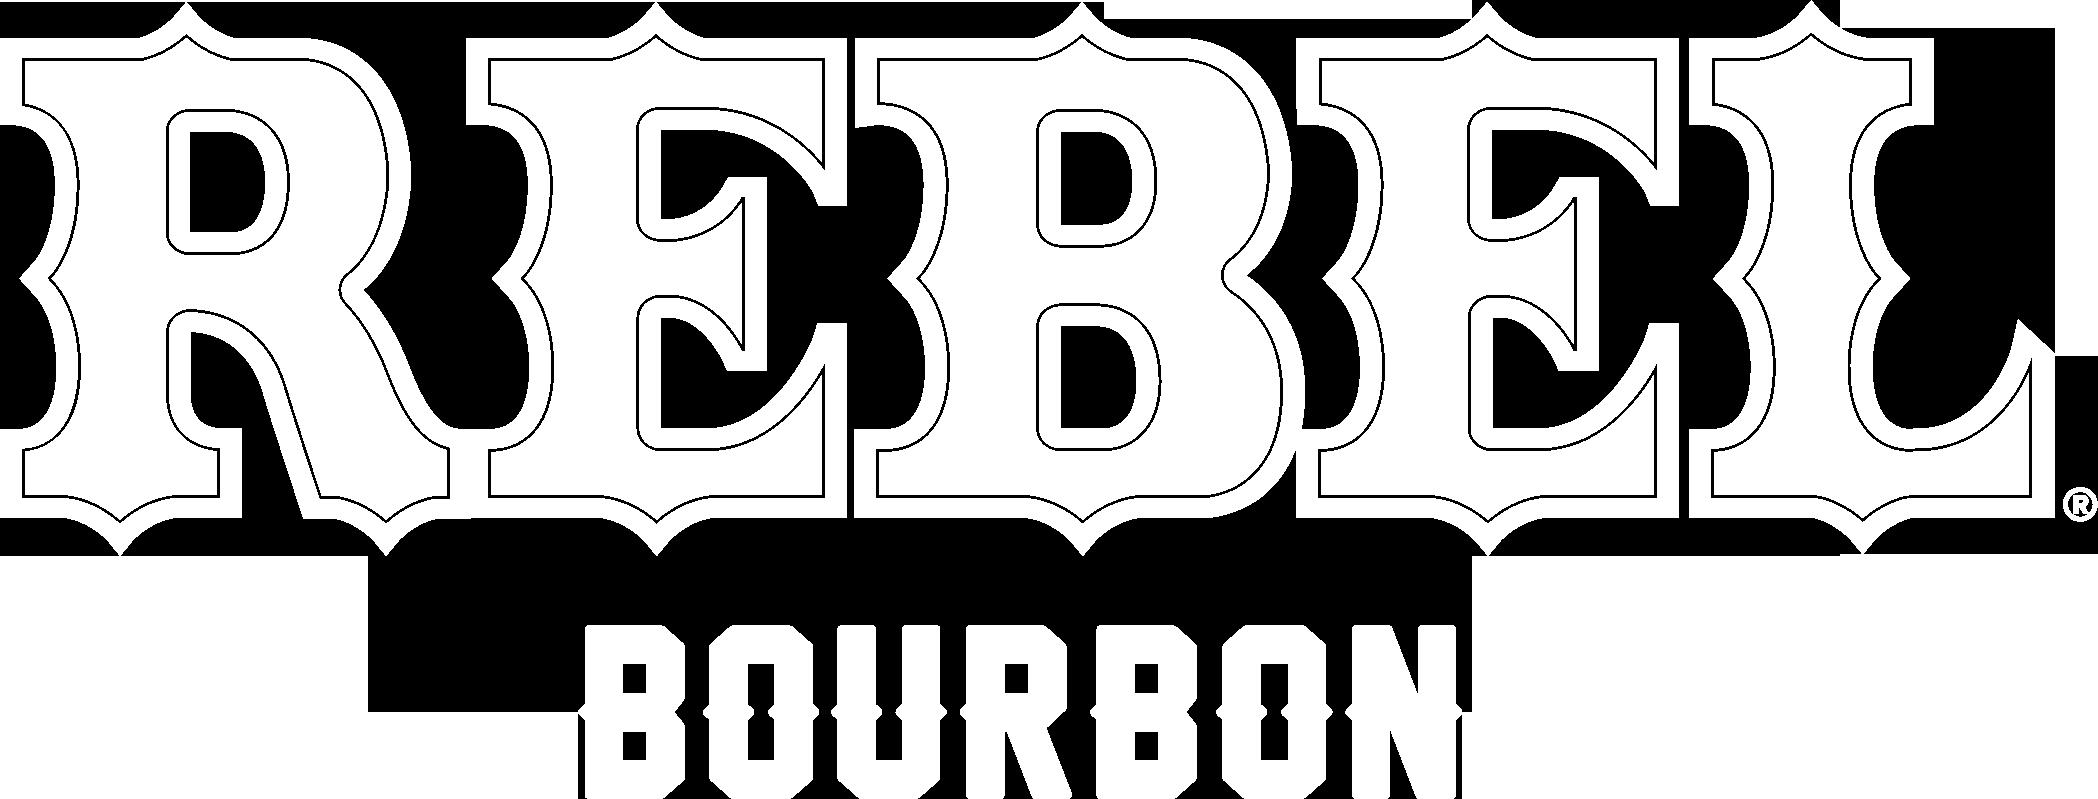 rebel-logo-white